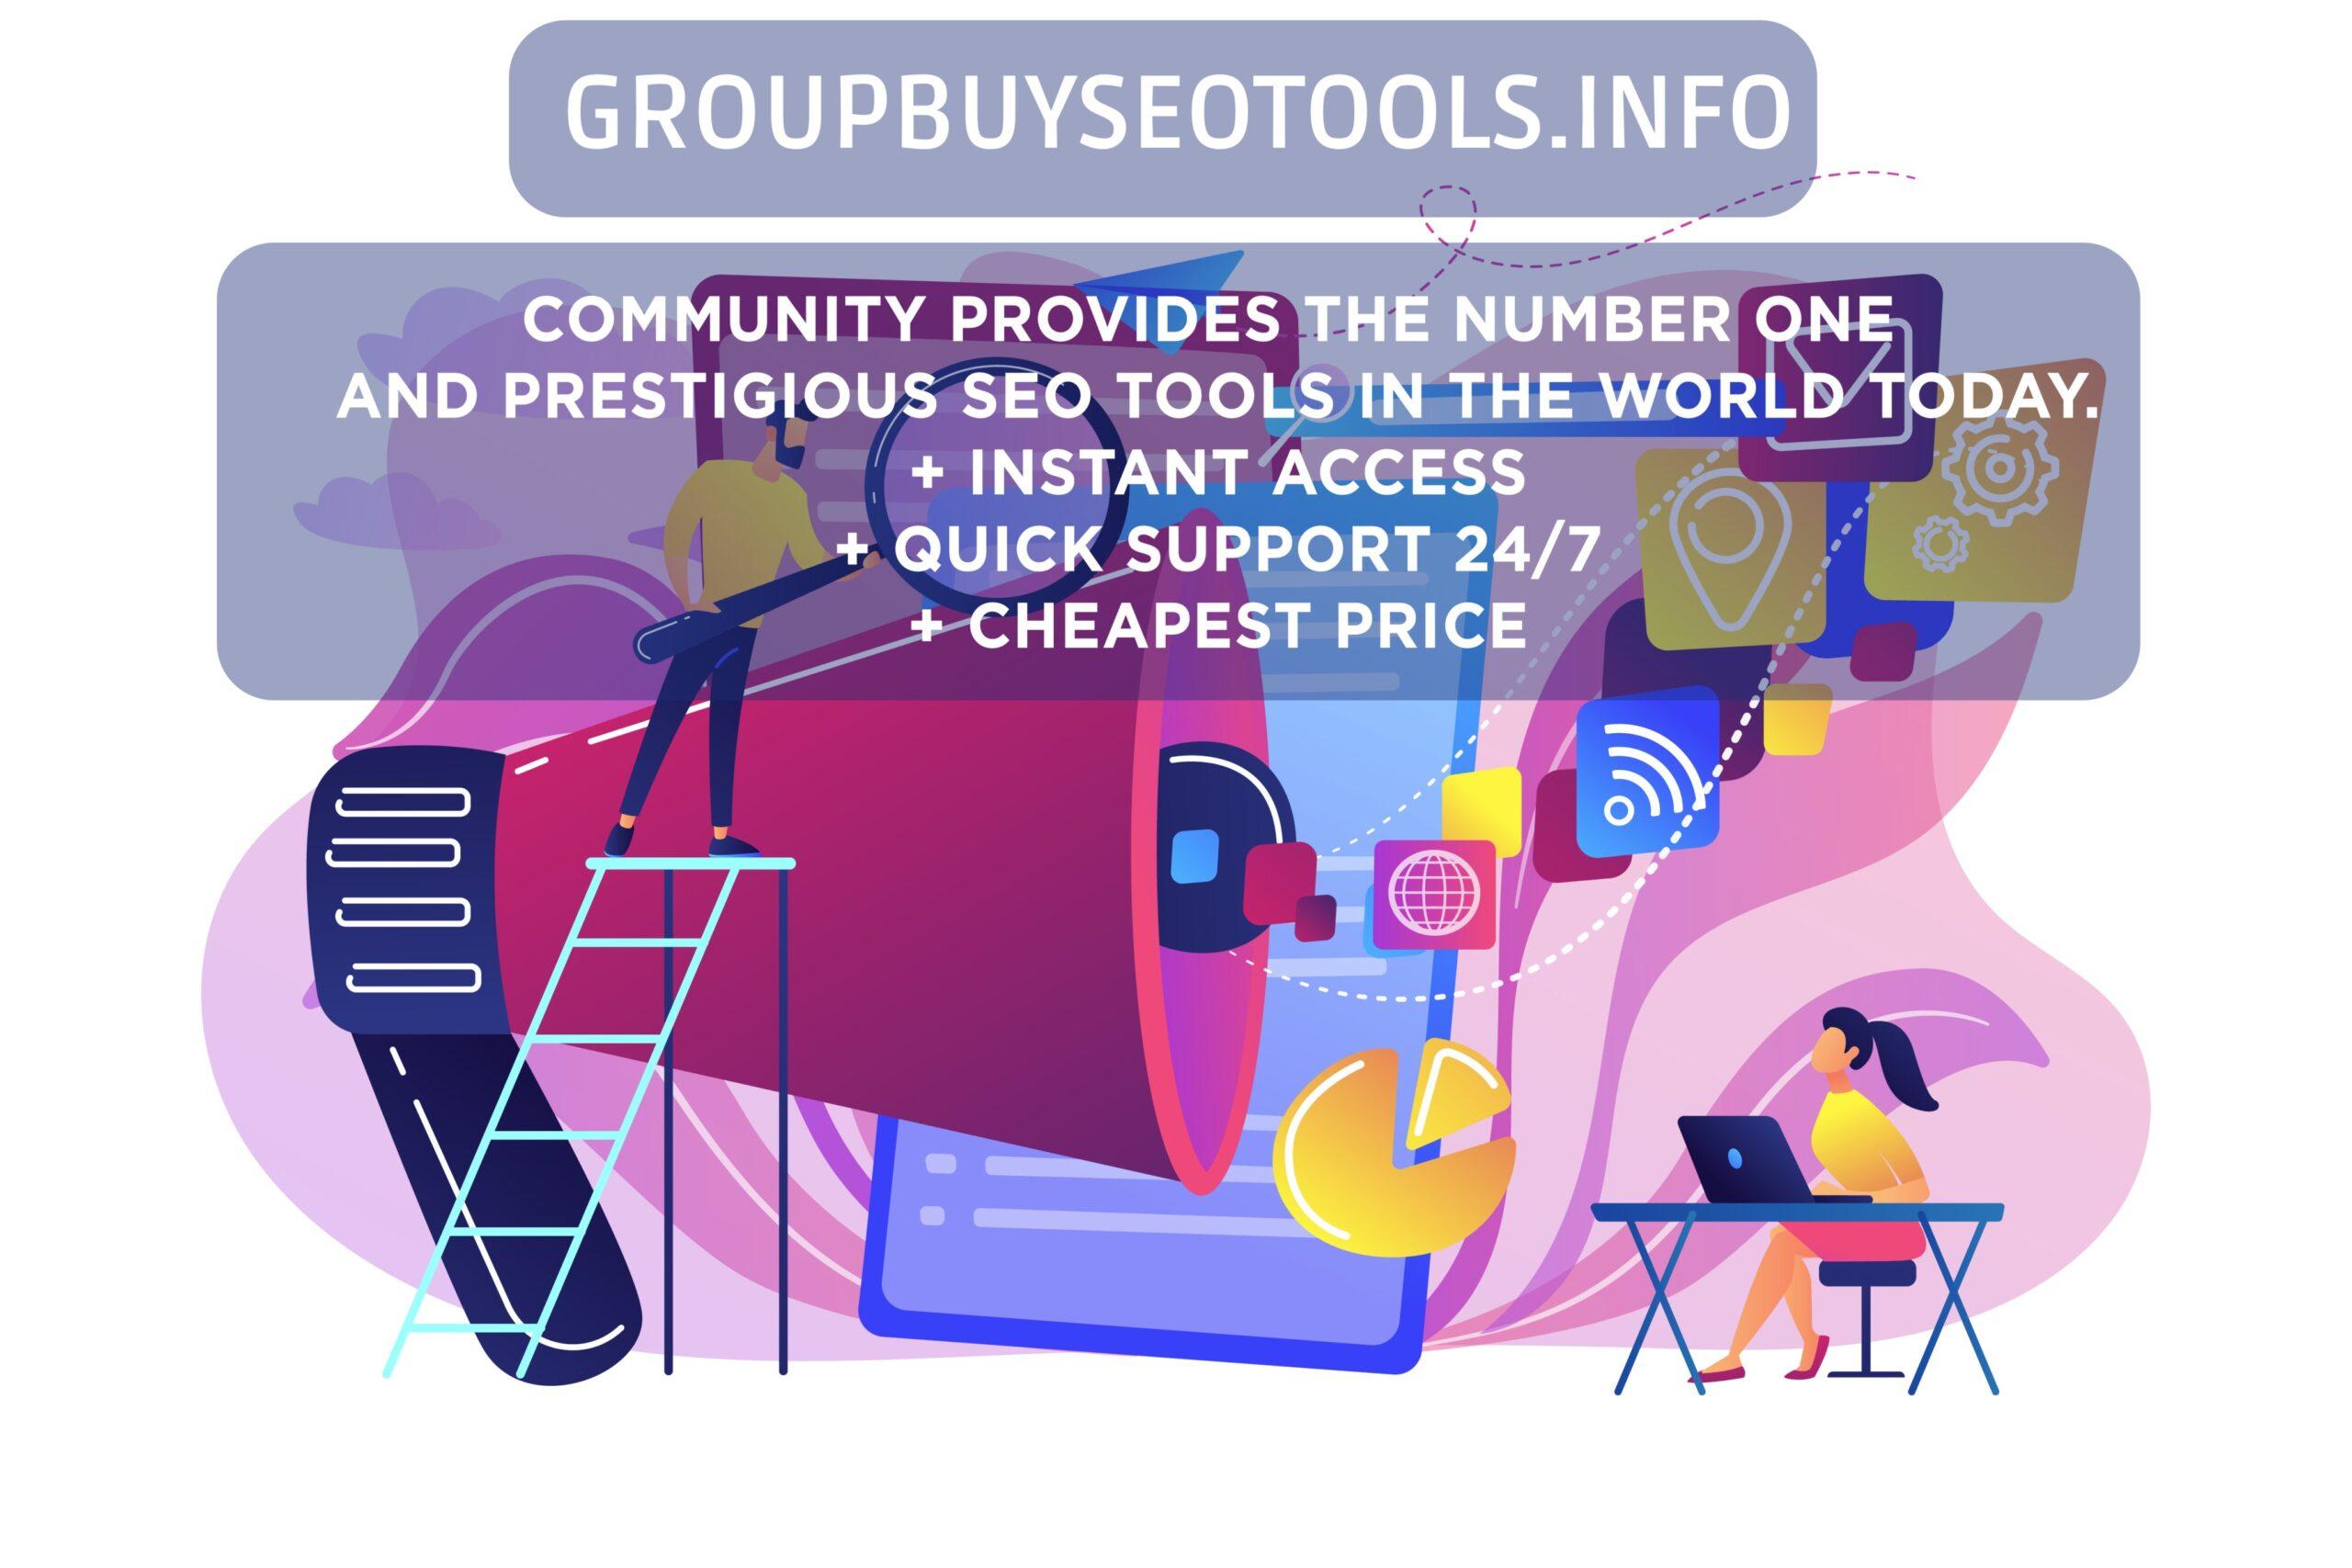 group-buy-seo-tools-image